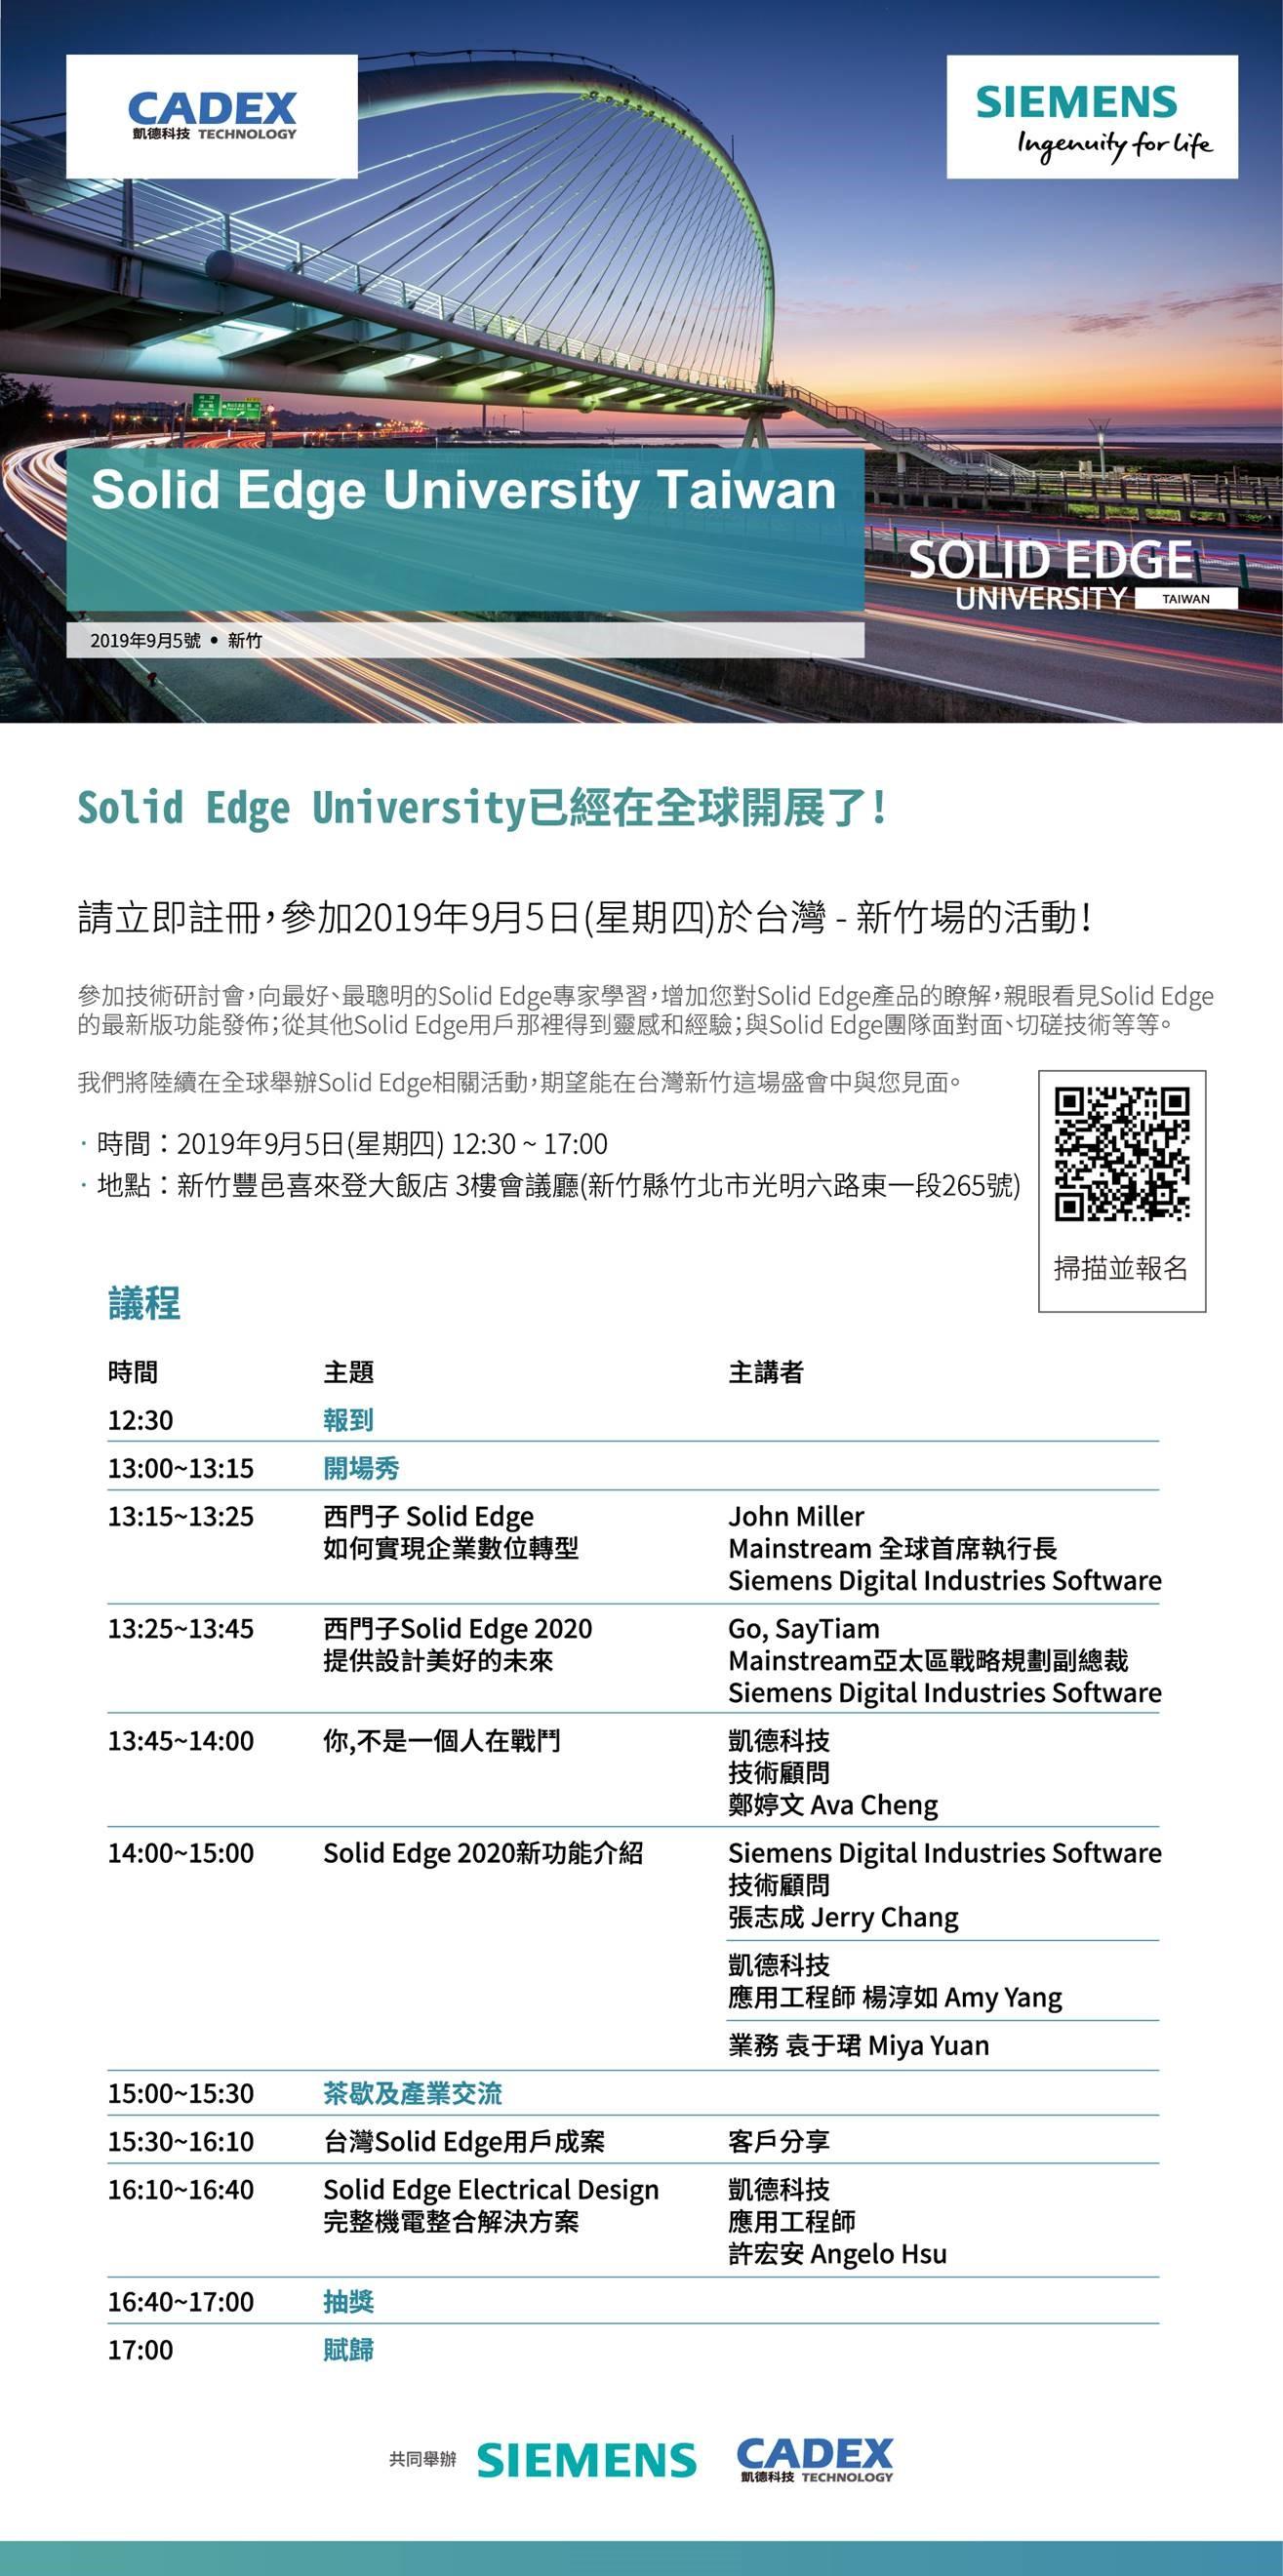 EDM-20190905 Solid Edge University